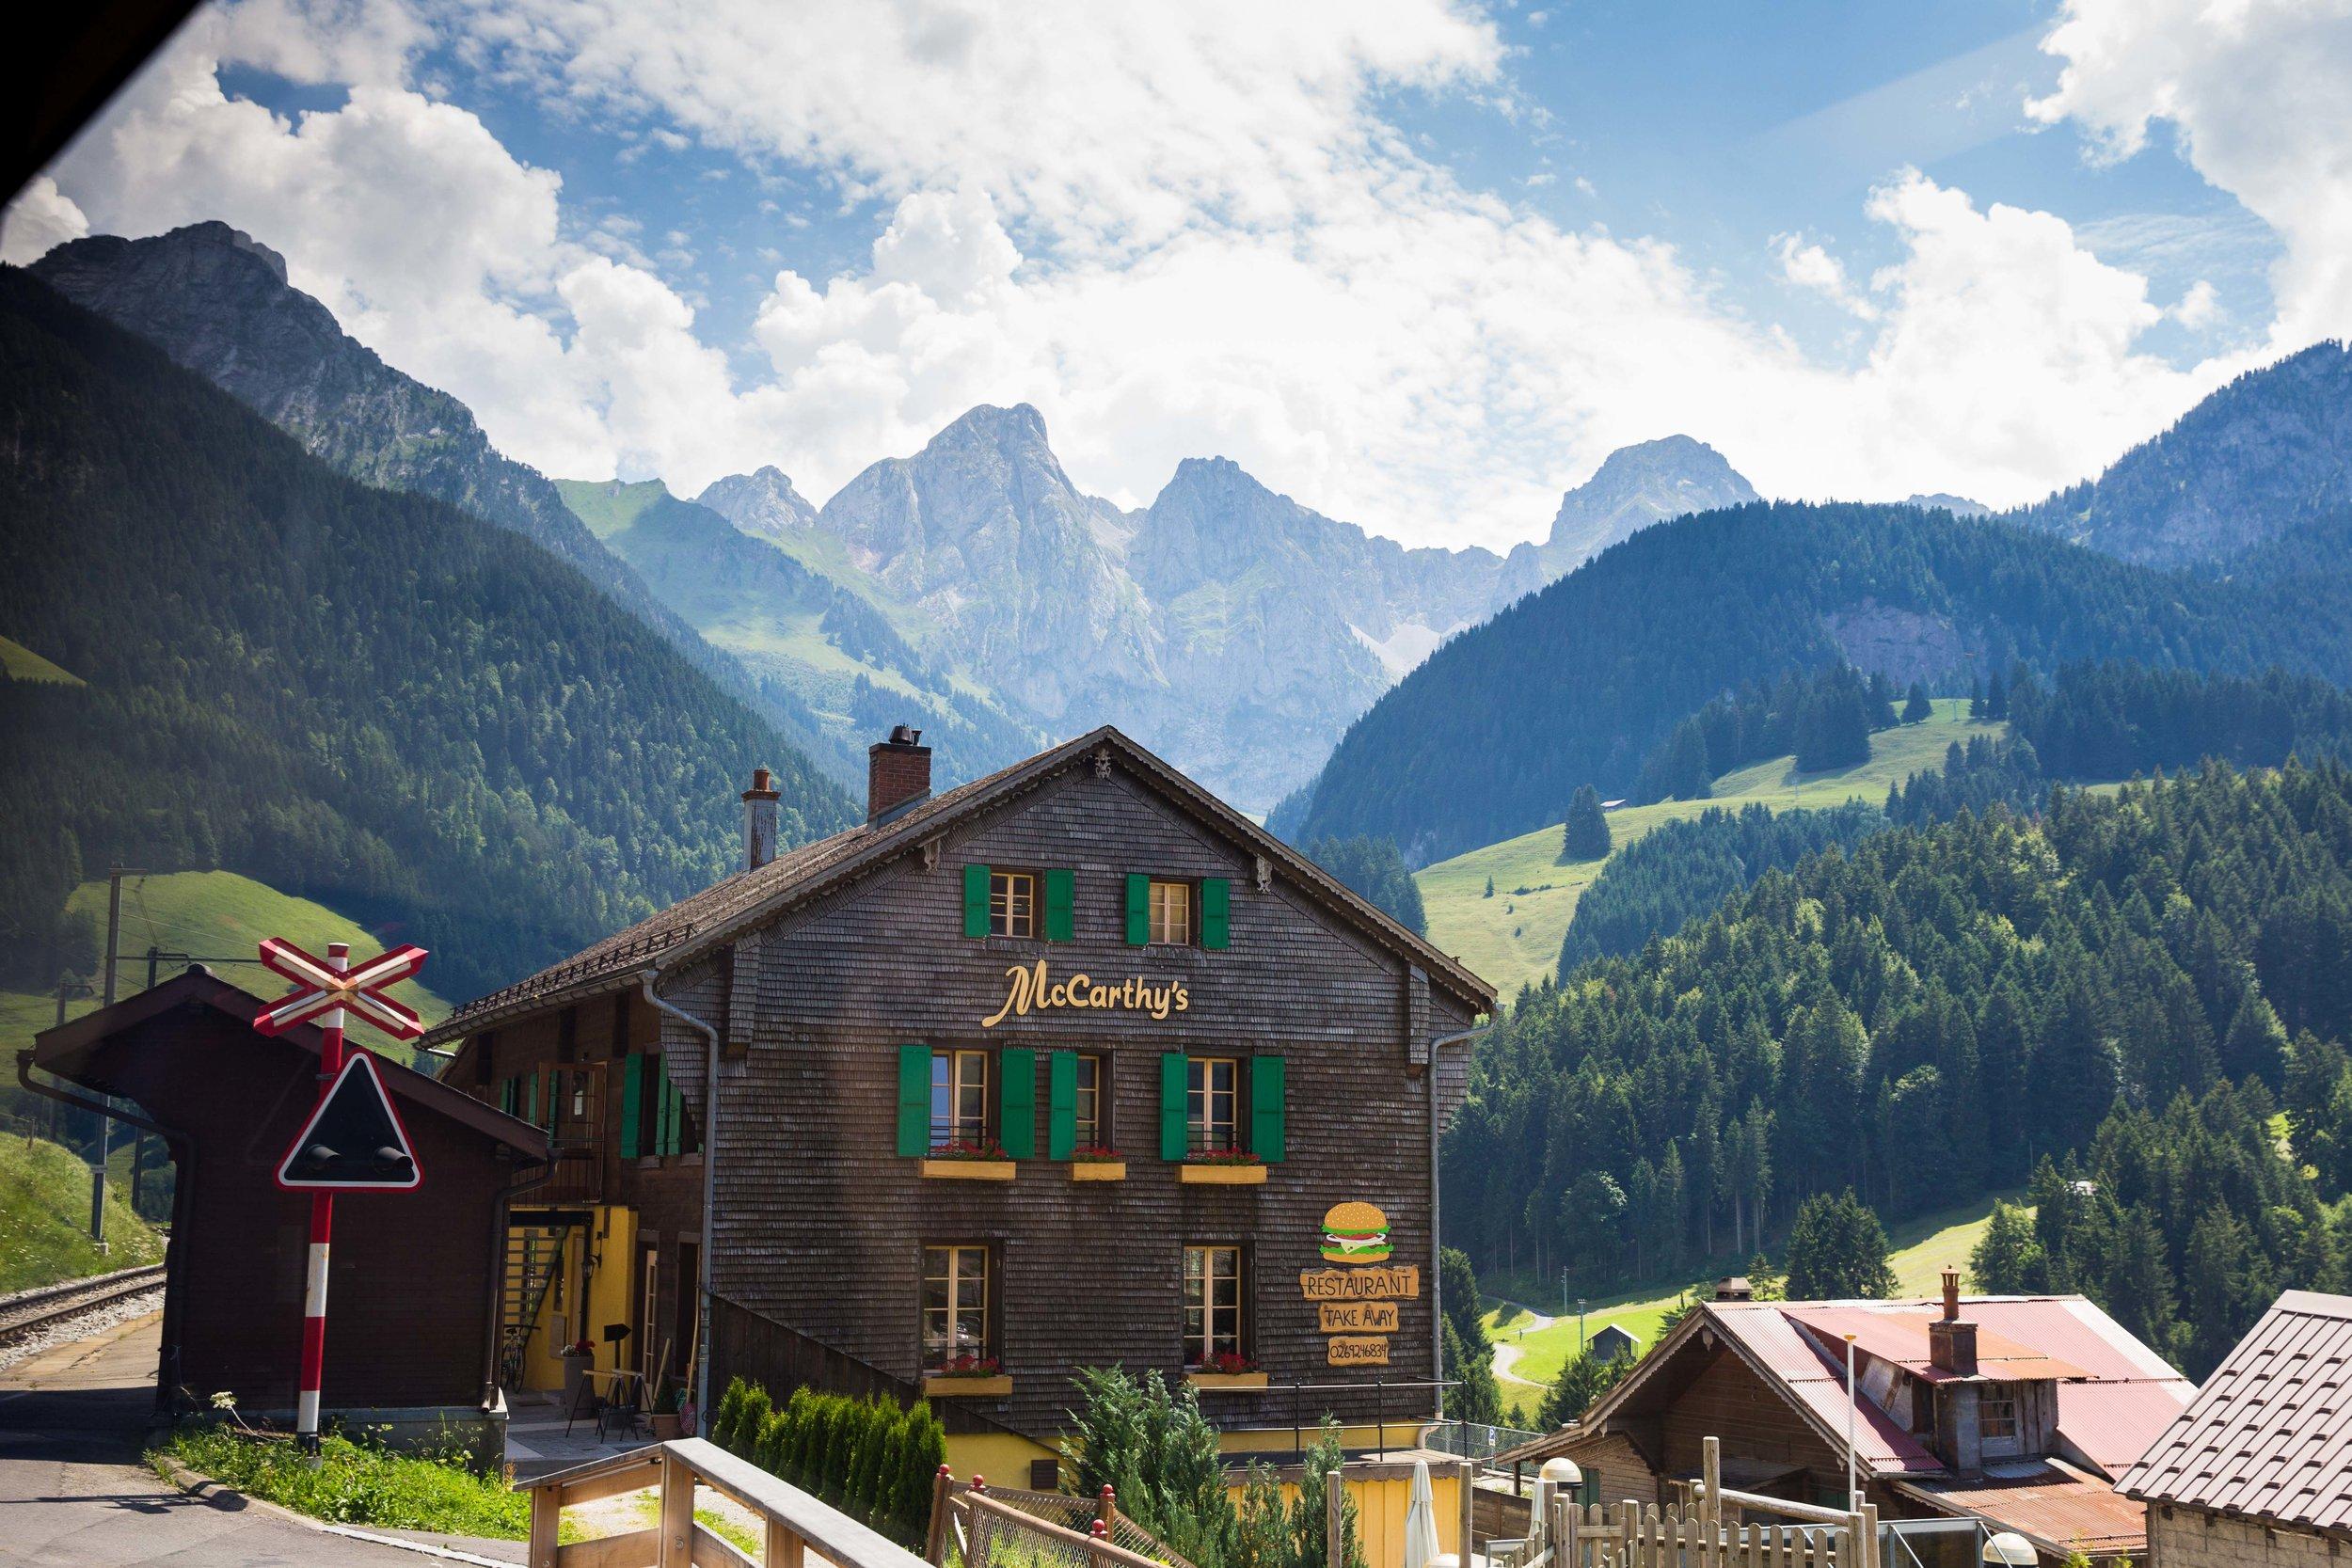 NickHopper_LeGrandBellevue_Gstaad-5940.jpg